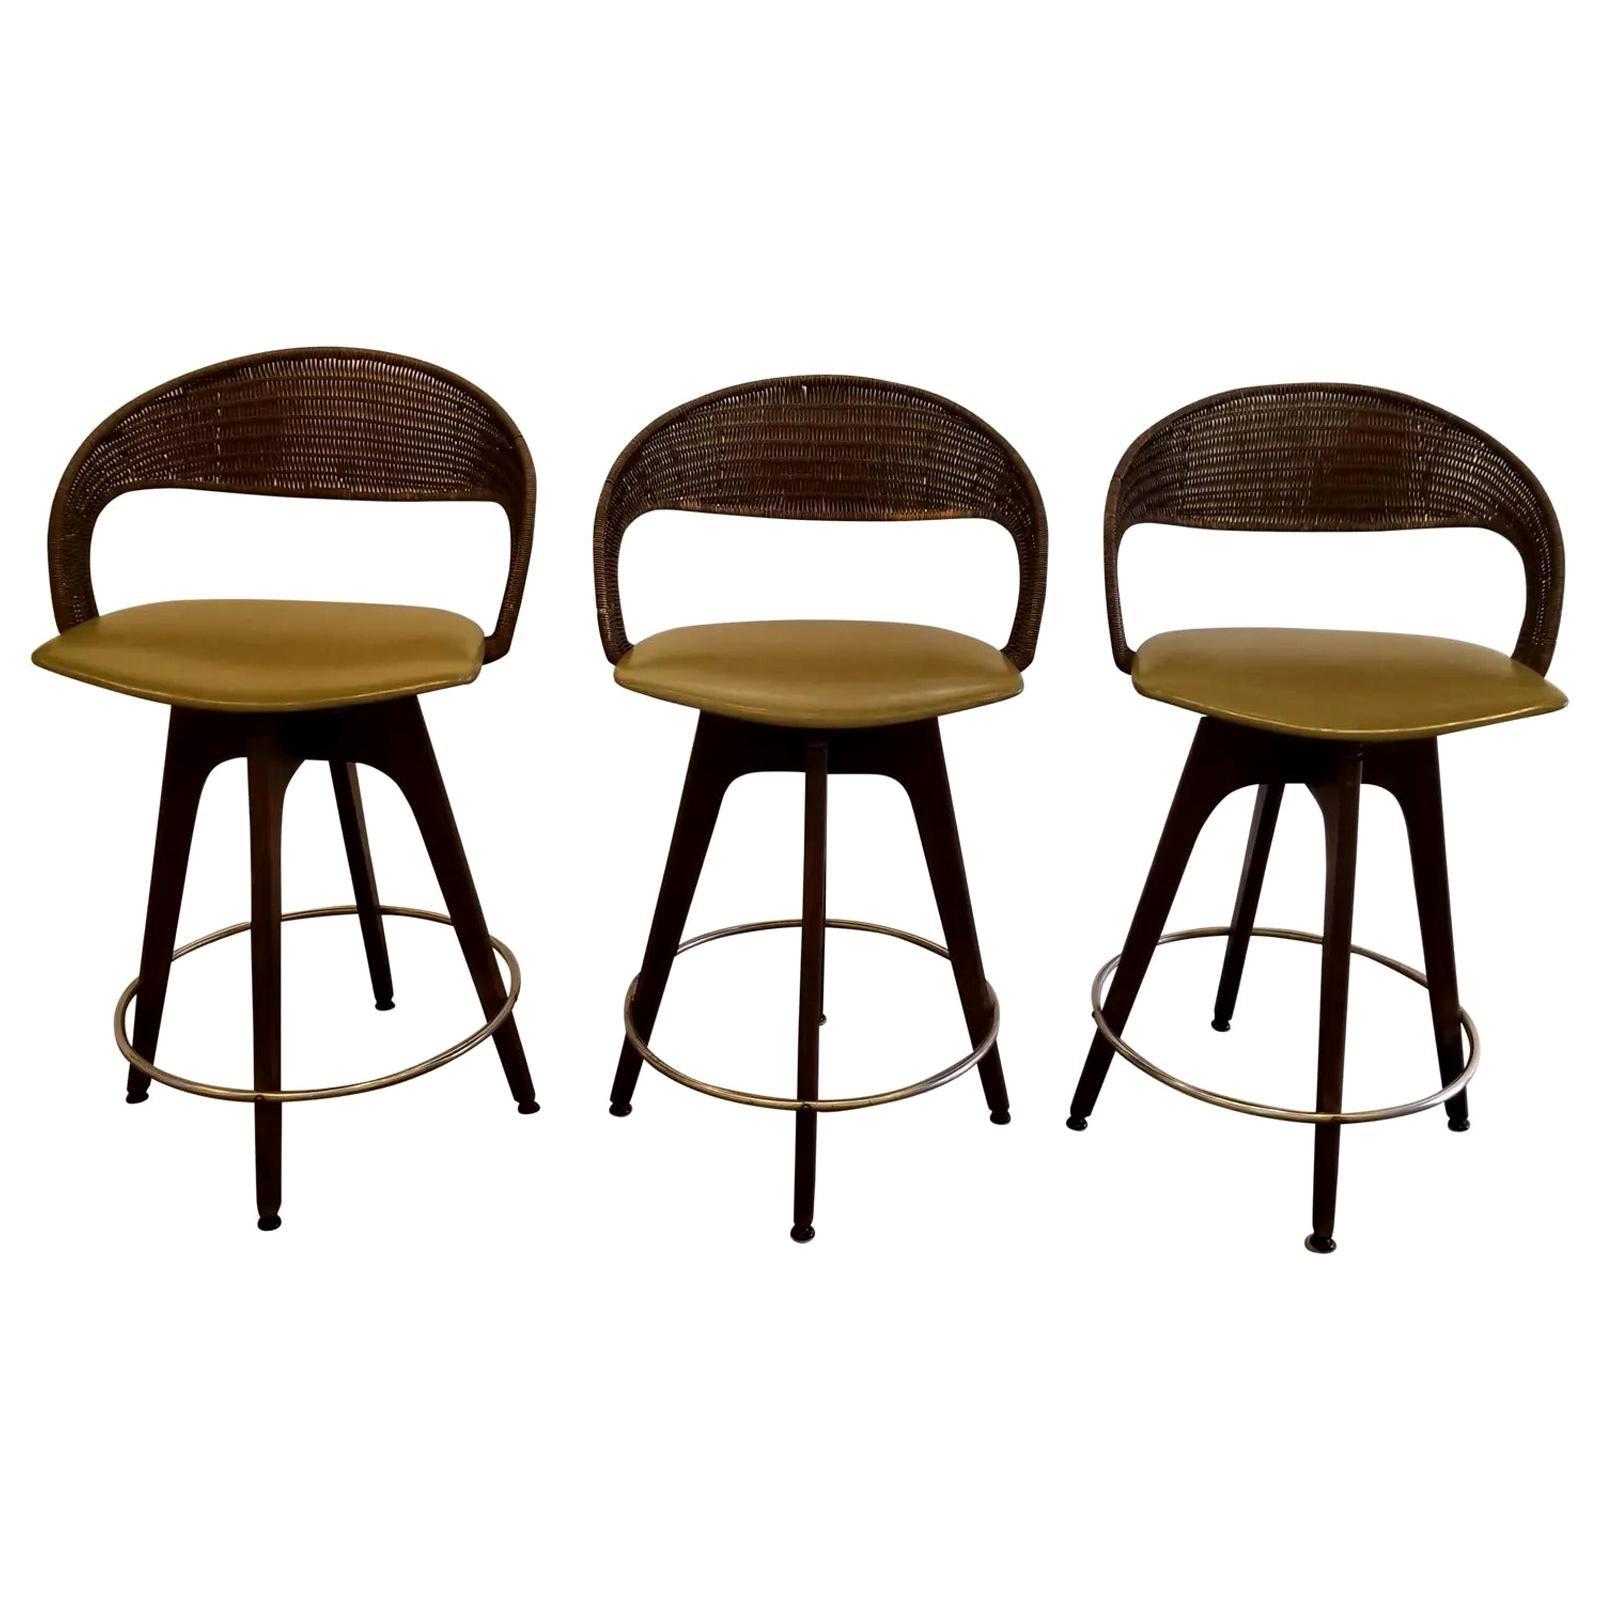 Chet Beardsley Mid-Century Modern Swivel Bar Stools, Set 3